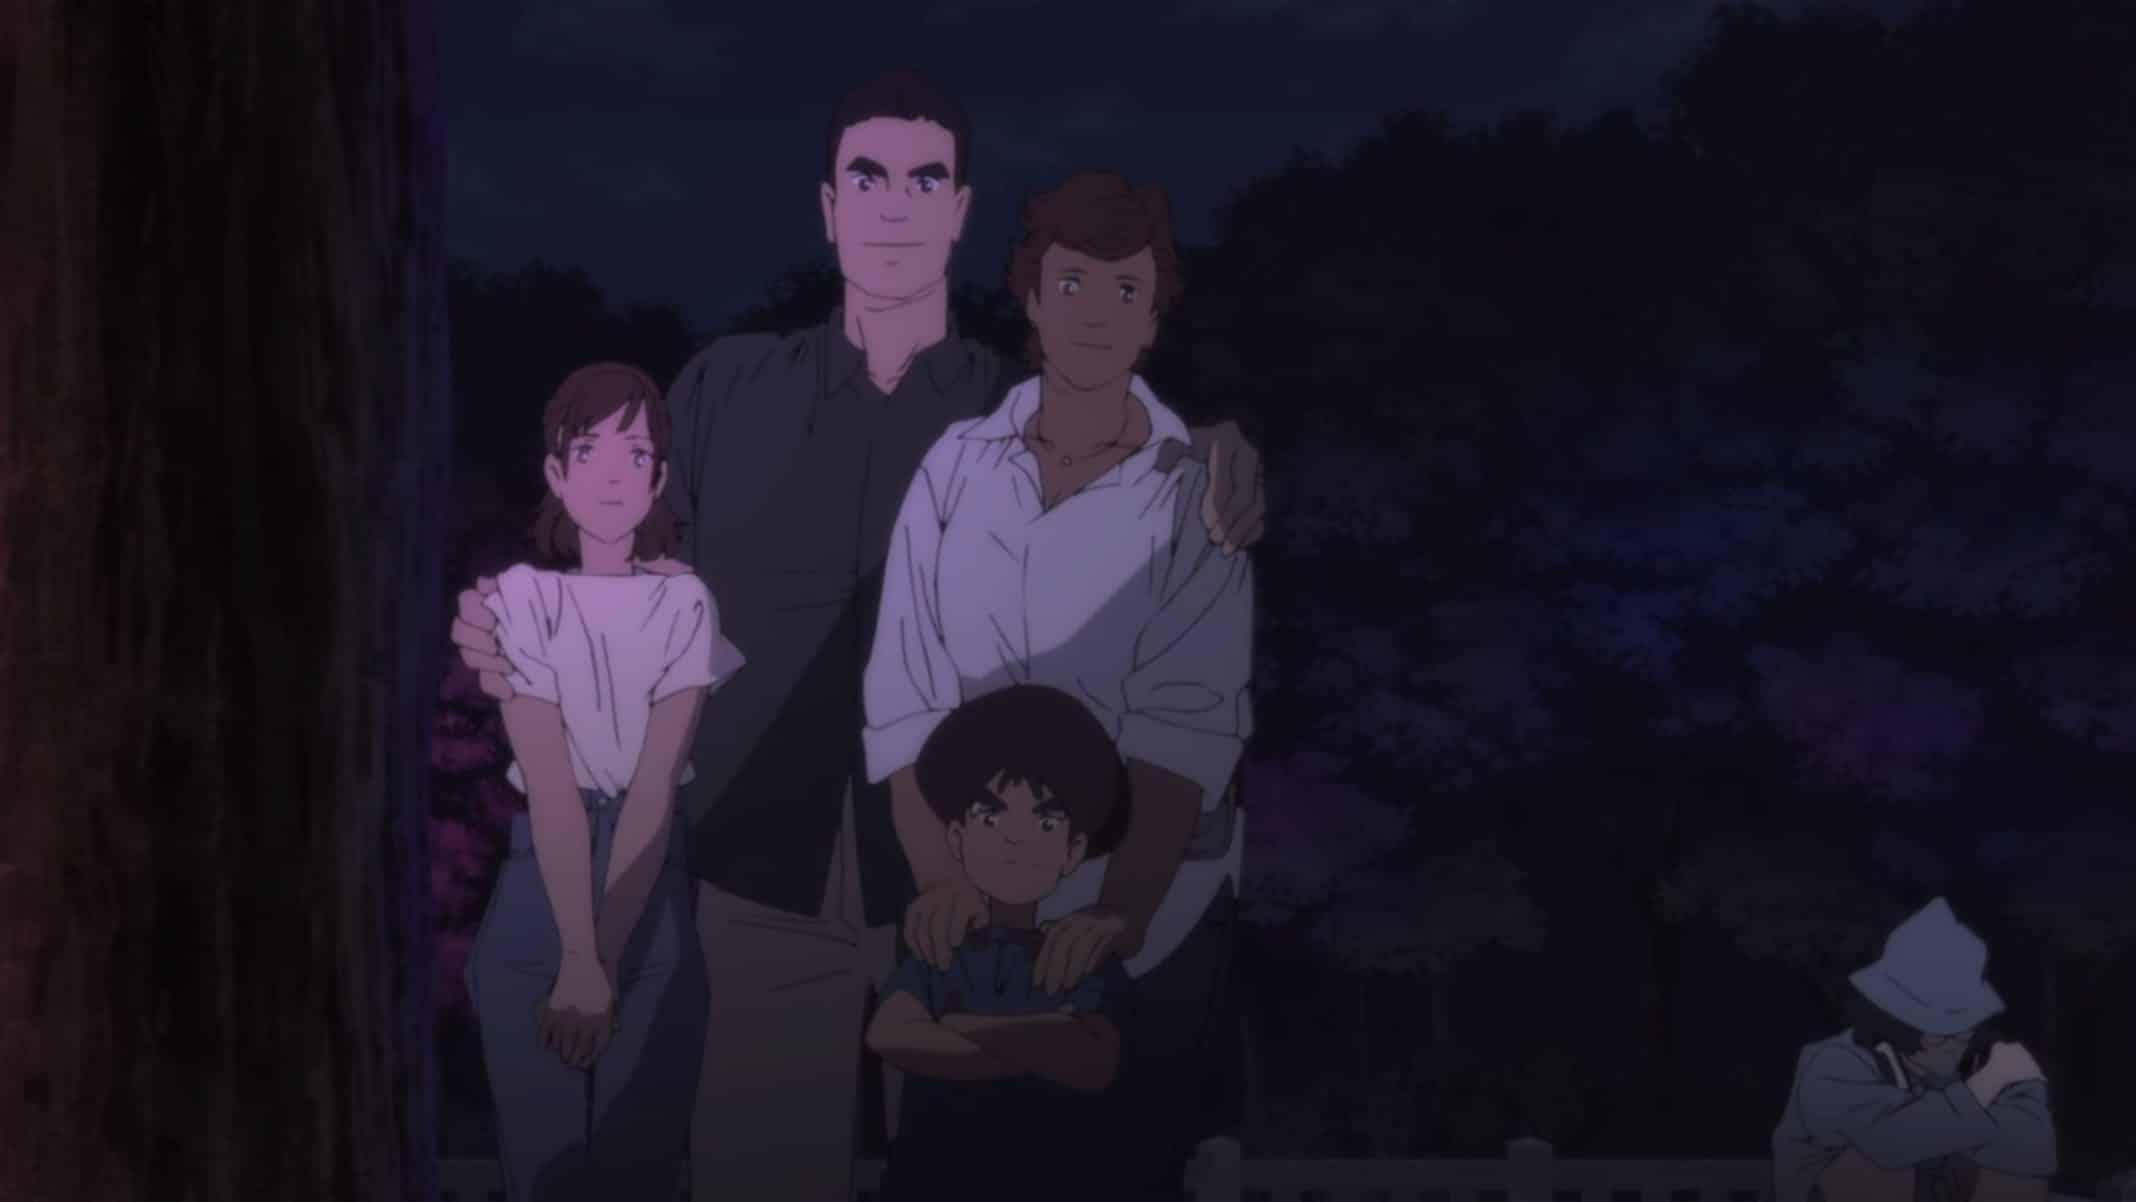 The Mutoh family: Mari (Sasaki Yuuko), Koichiro (Terasoma Masaki), Mari (Sasaki Yuuko), and Go (Muranaka Tomo)